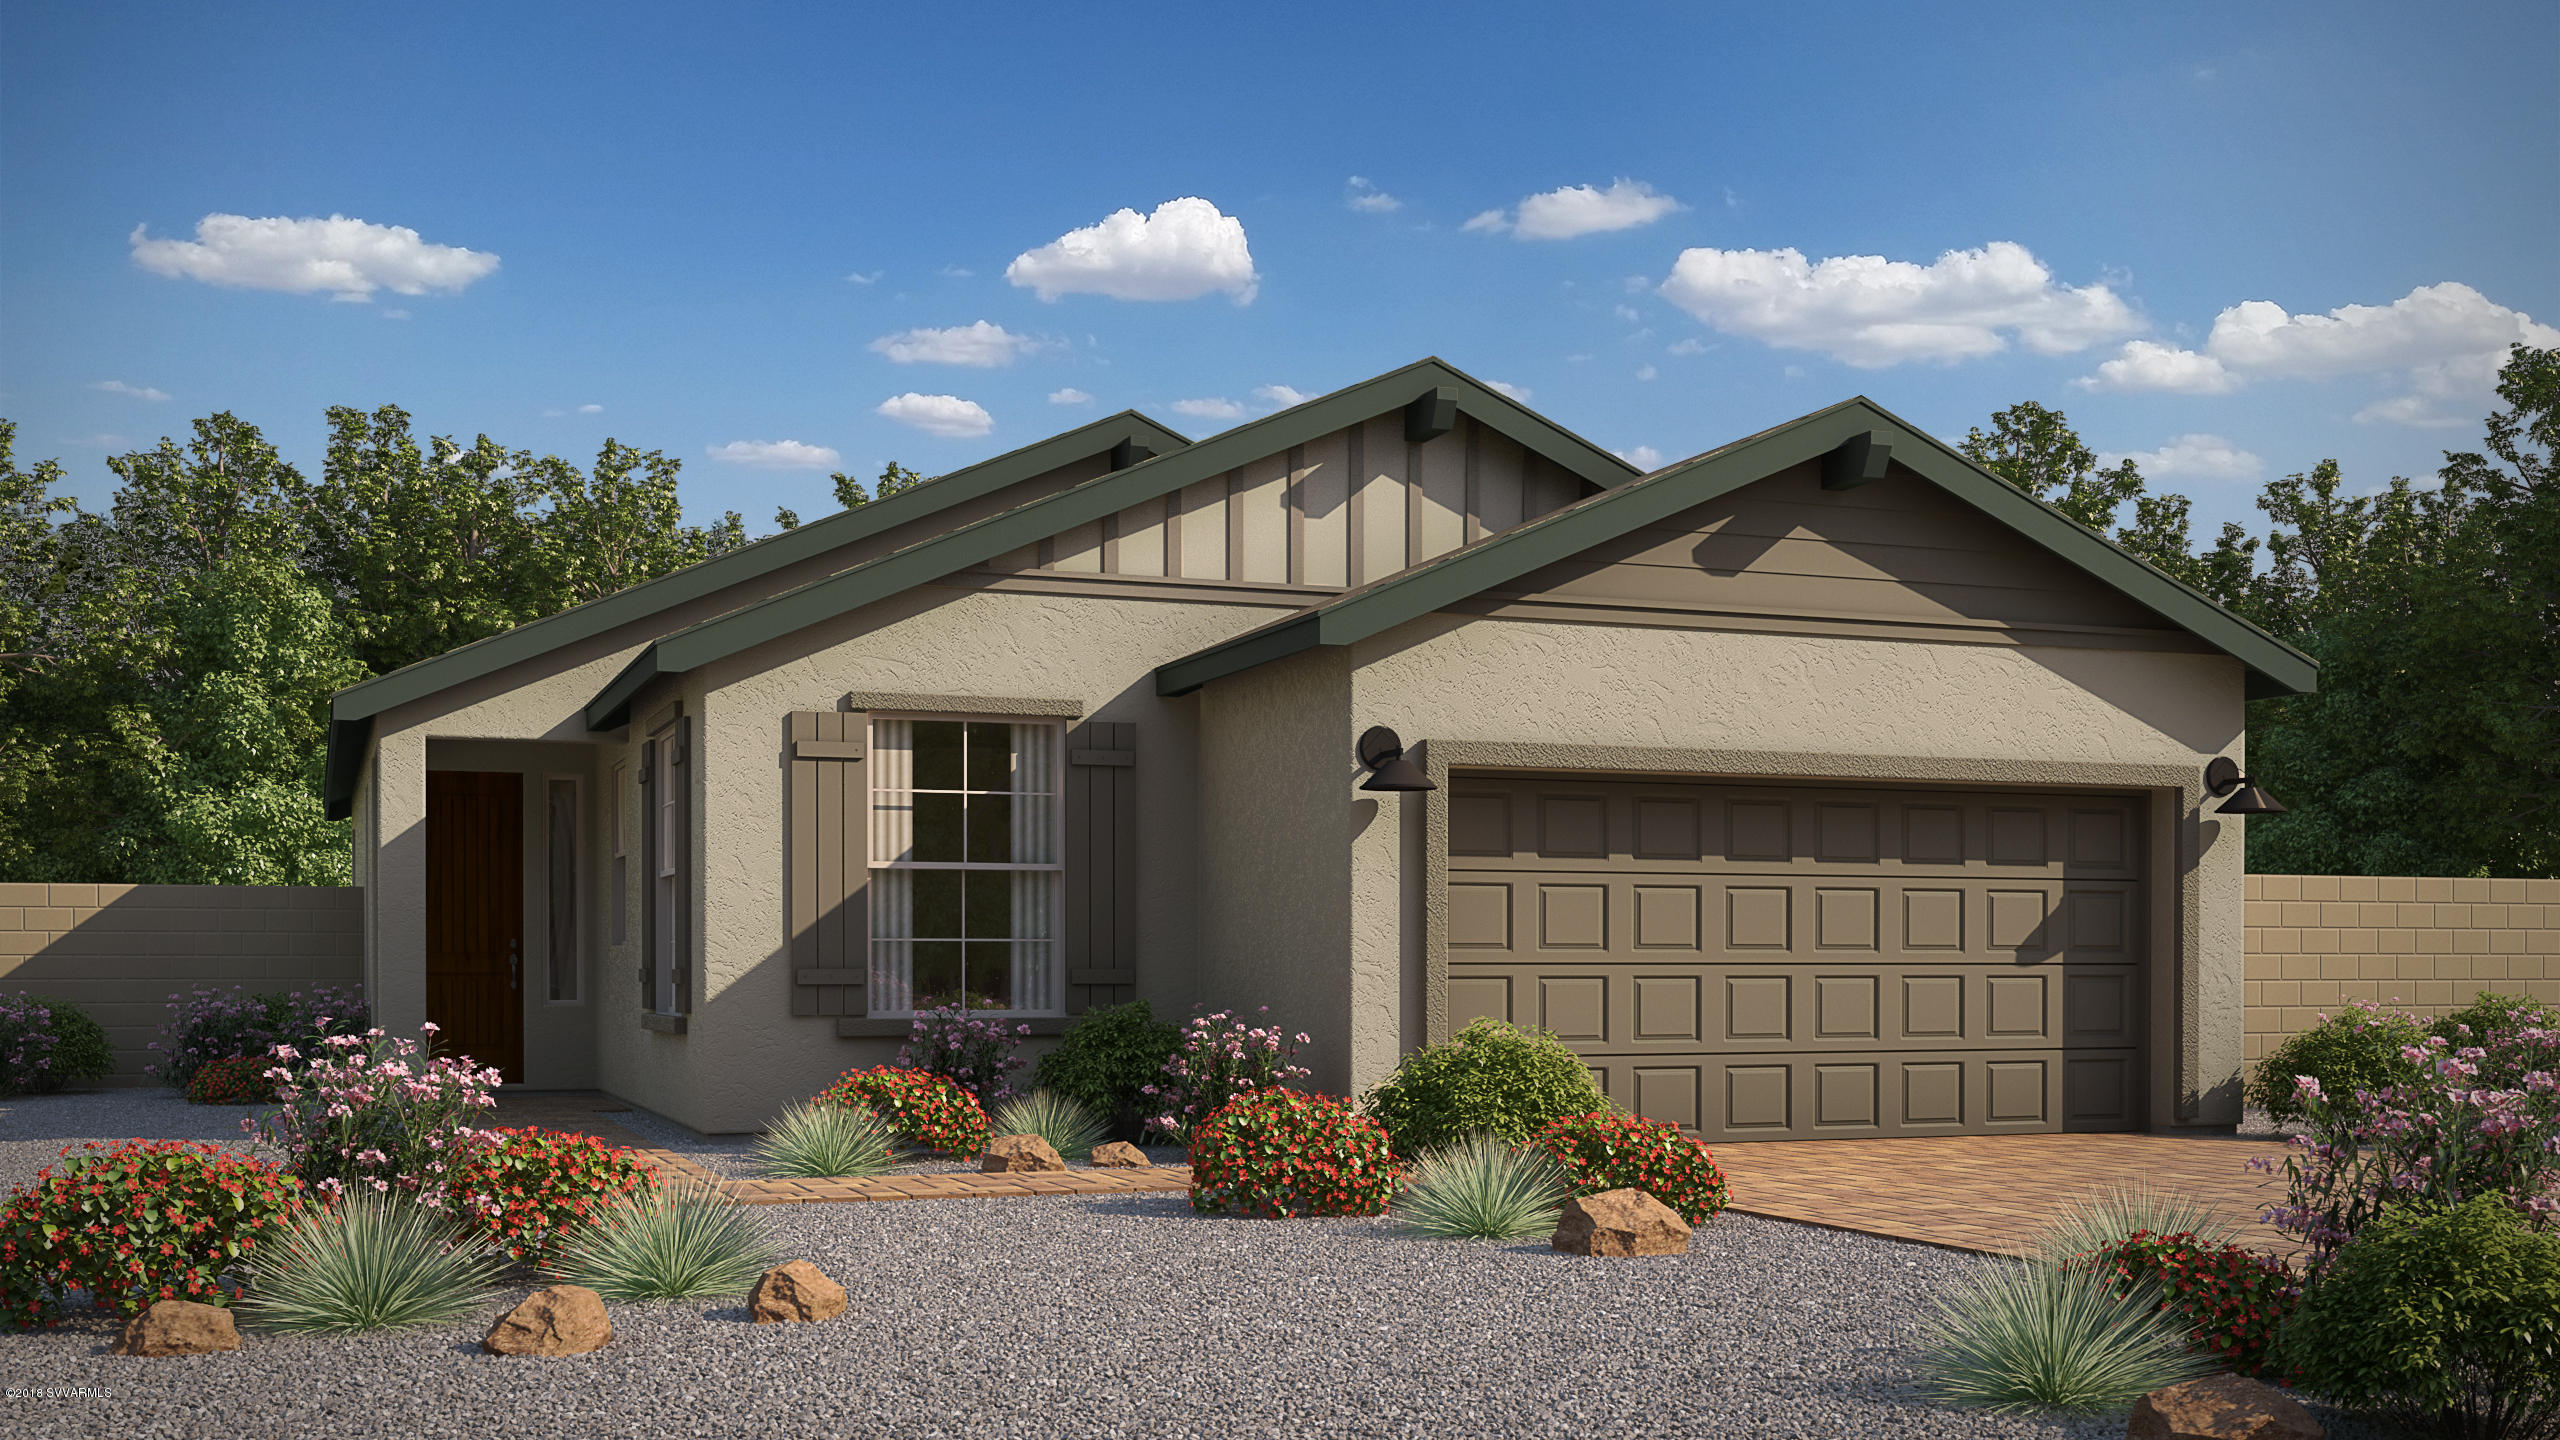 556 Ruffner Lane Clarkdale, AZ 86324